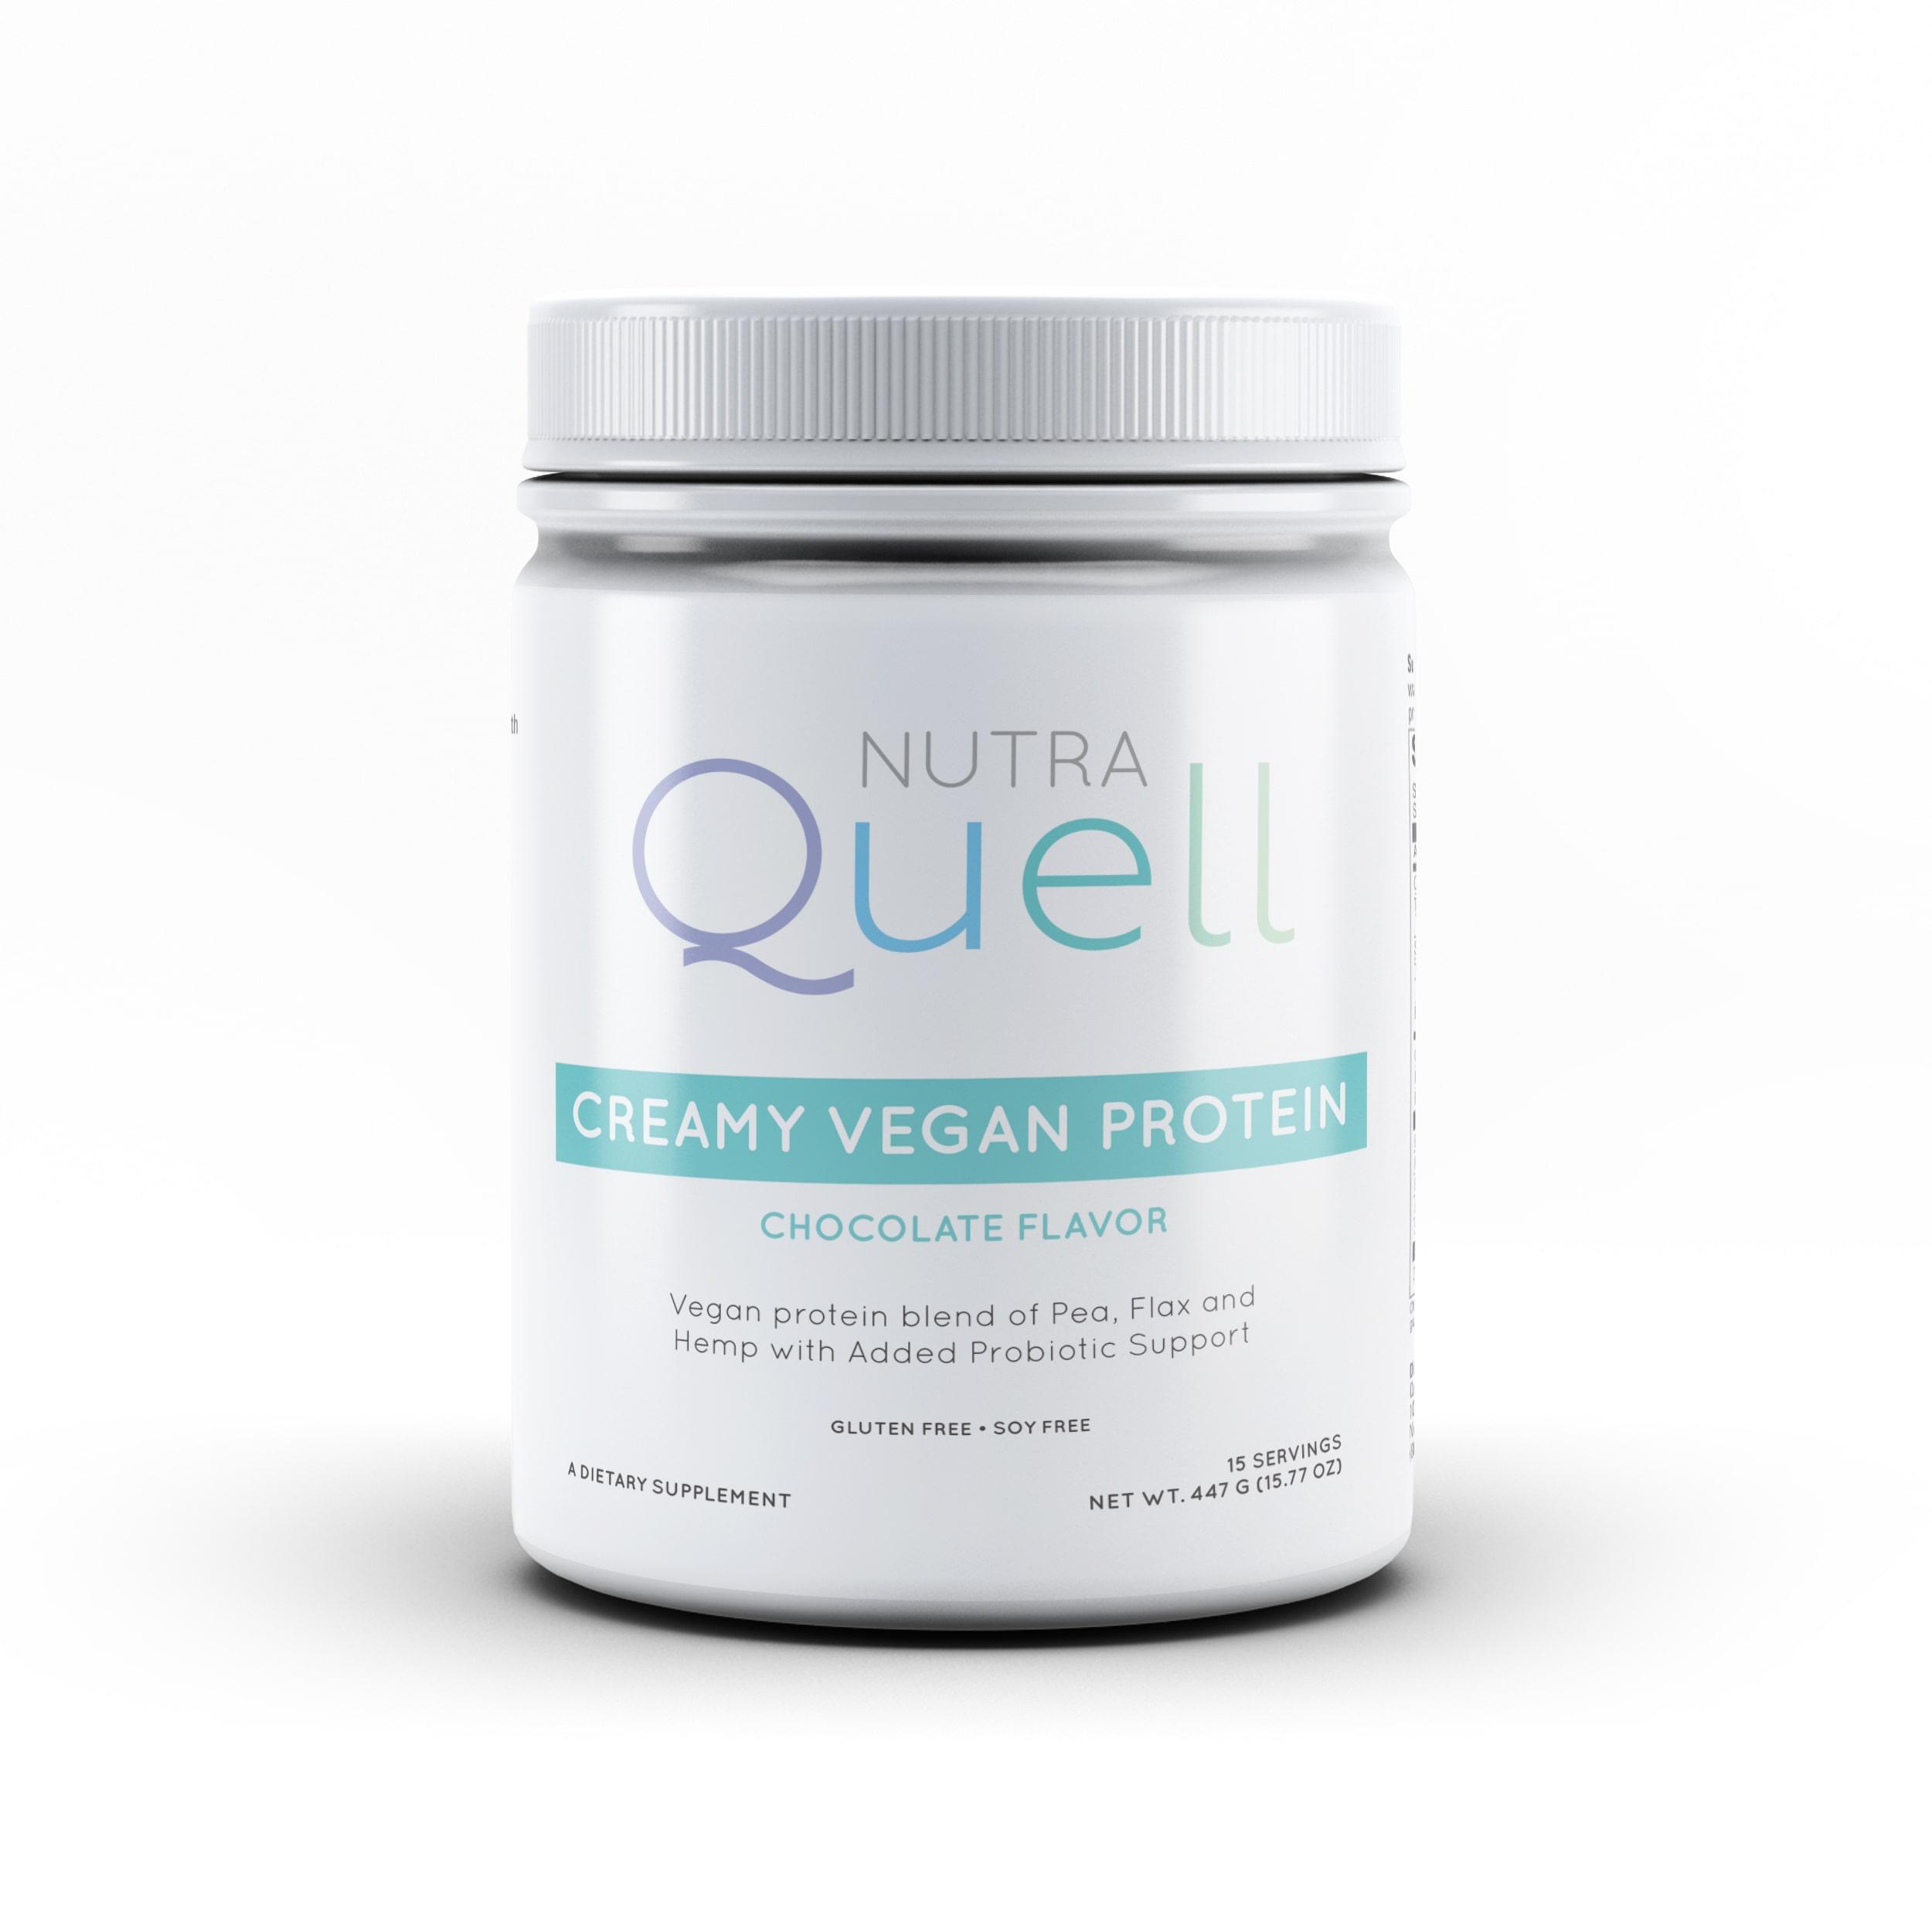 Creamy Vegan Protein Chocolate